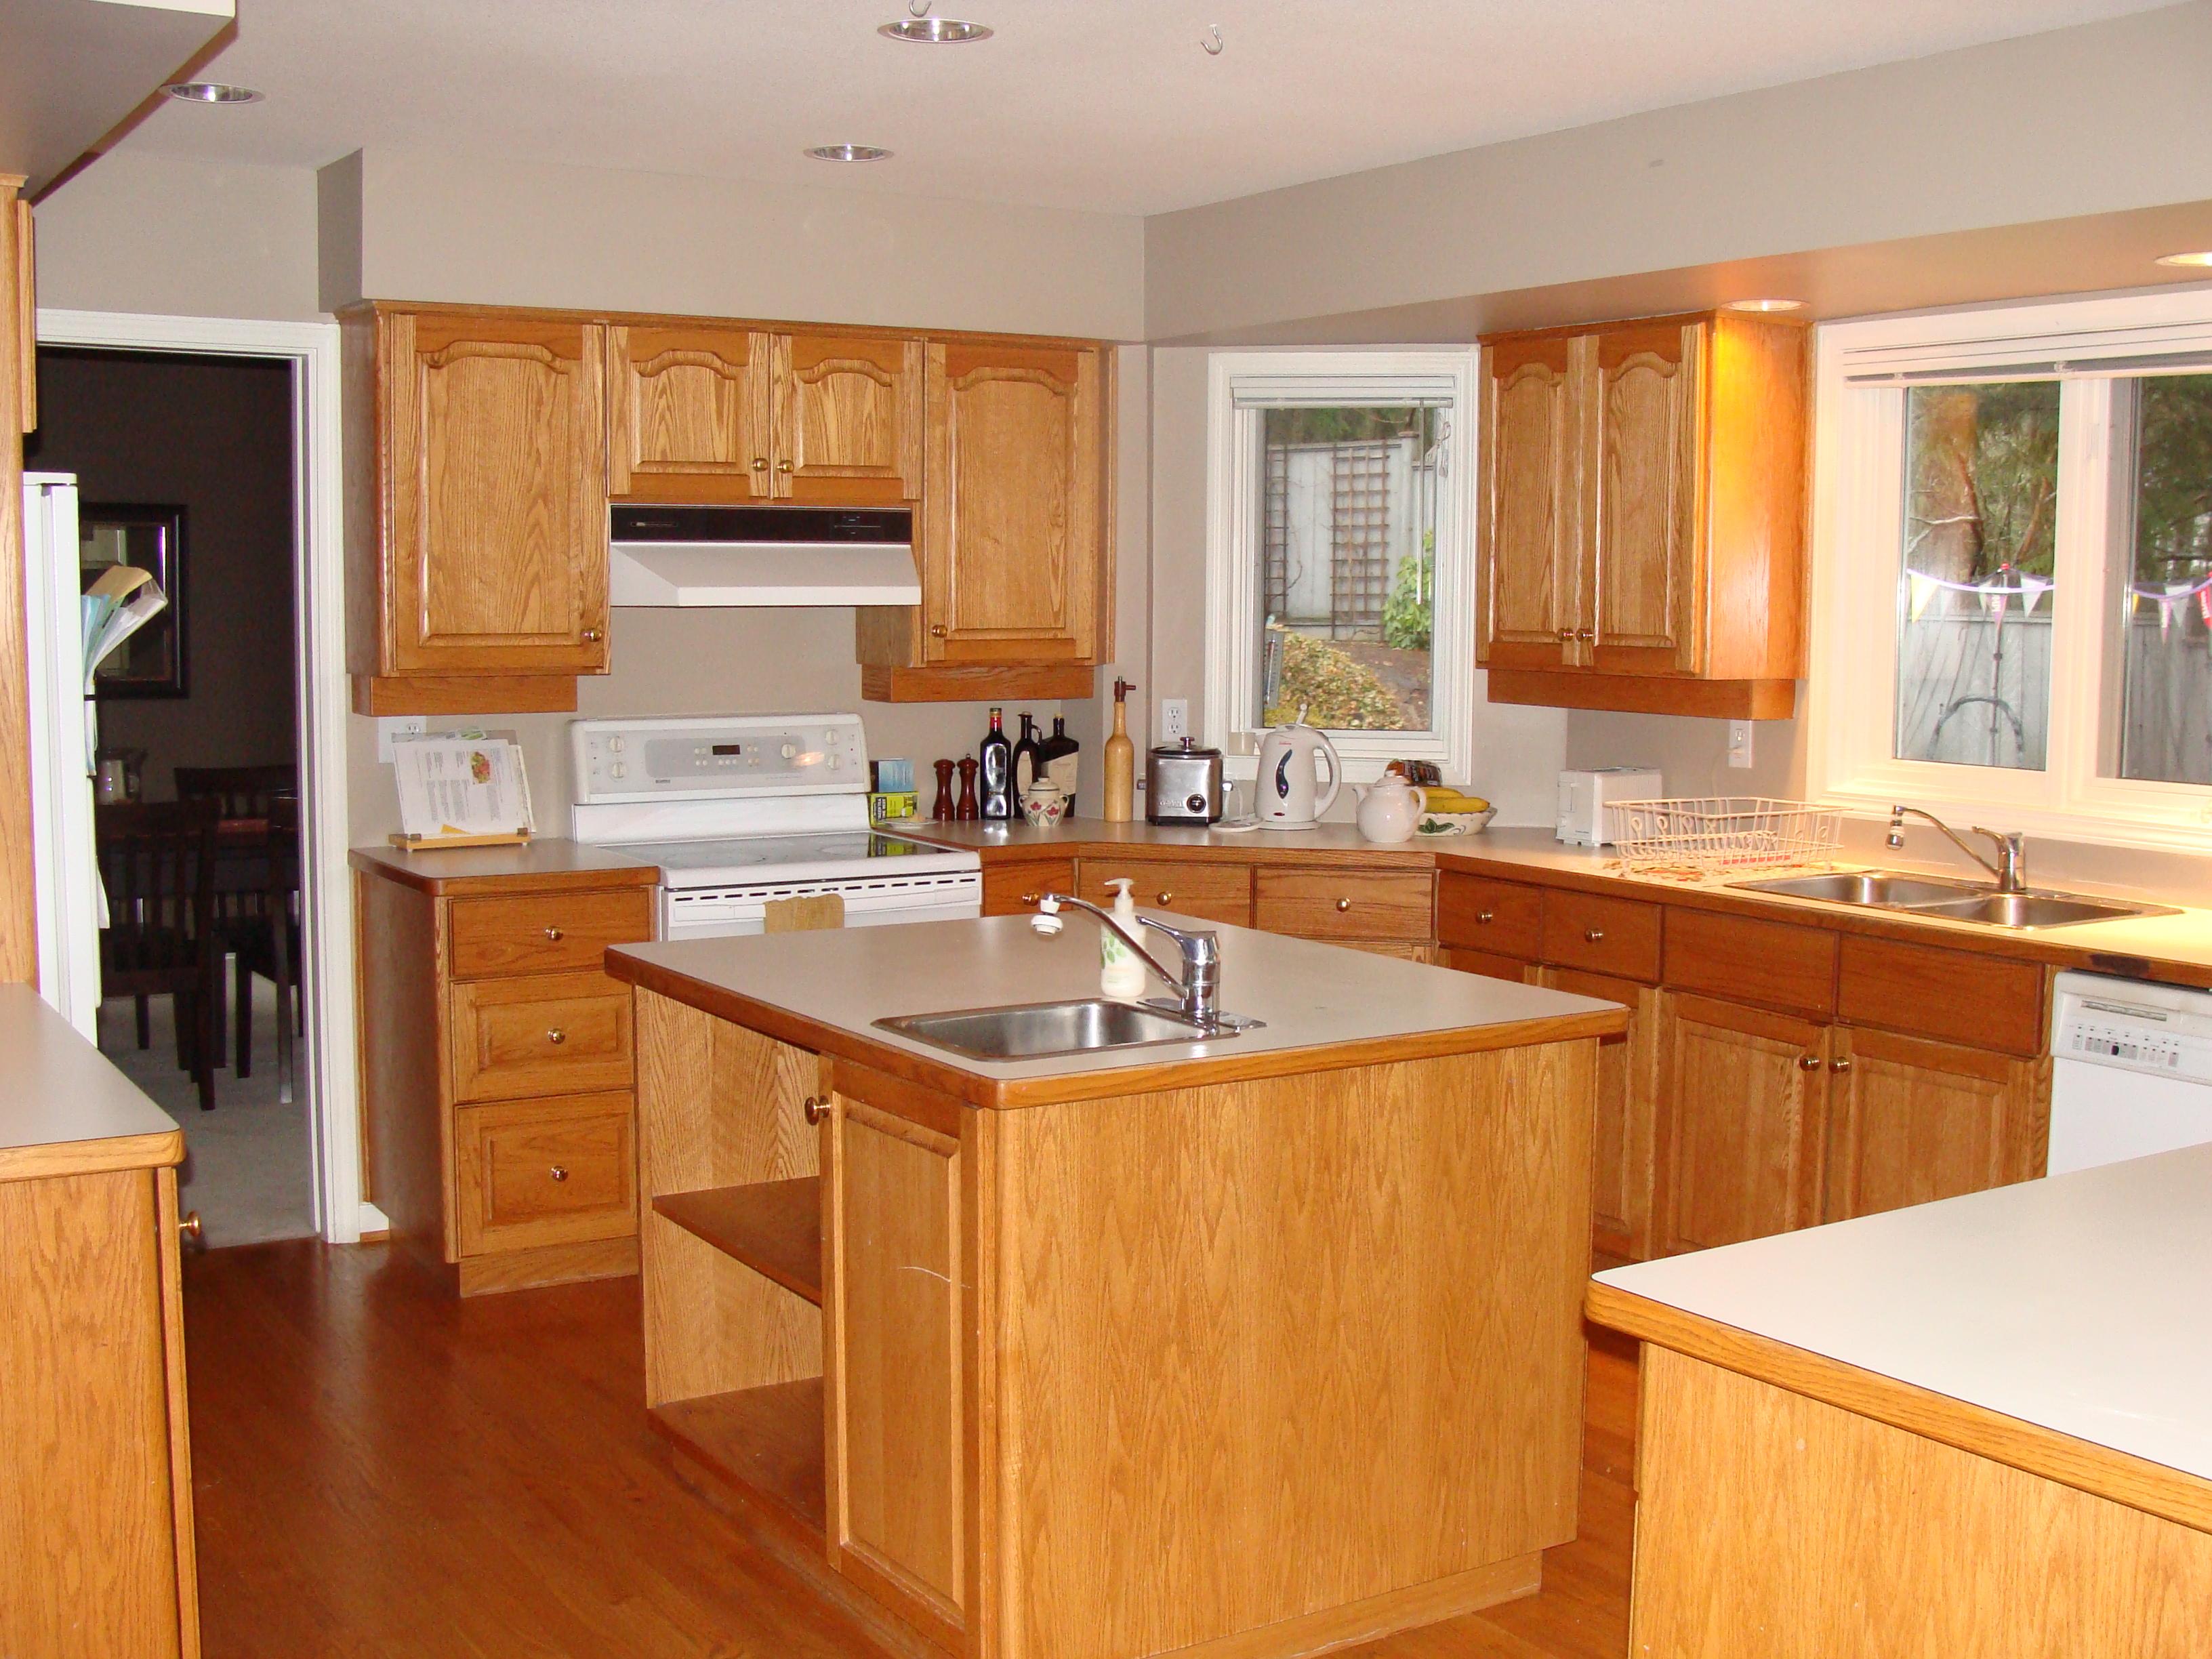 Small appliances for kitchen Photo - 7